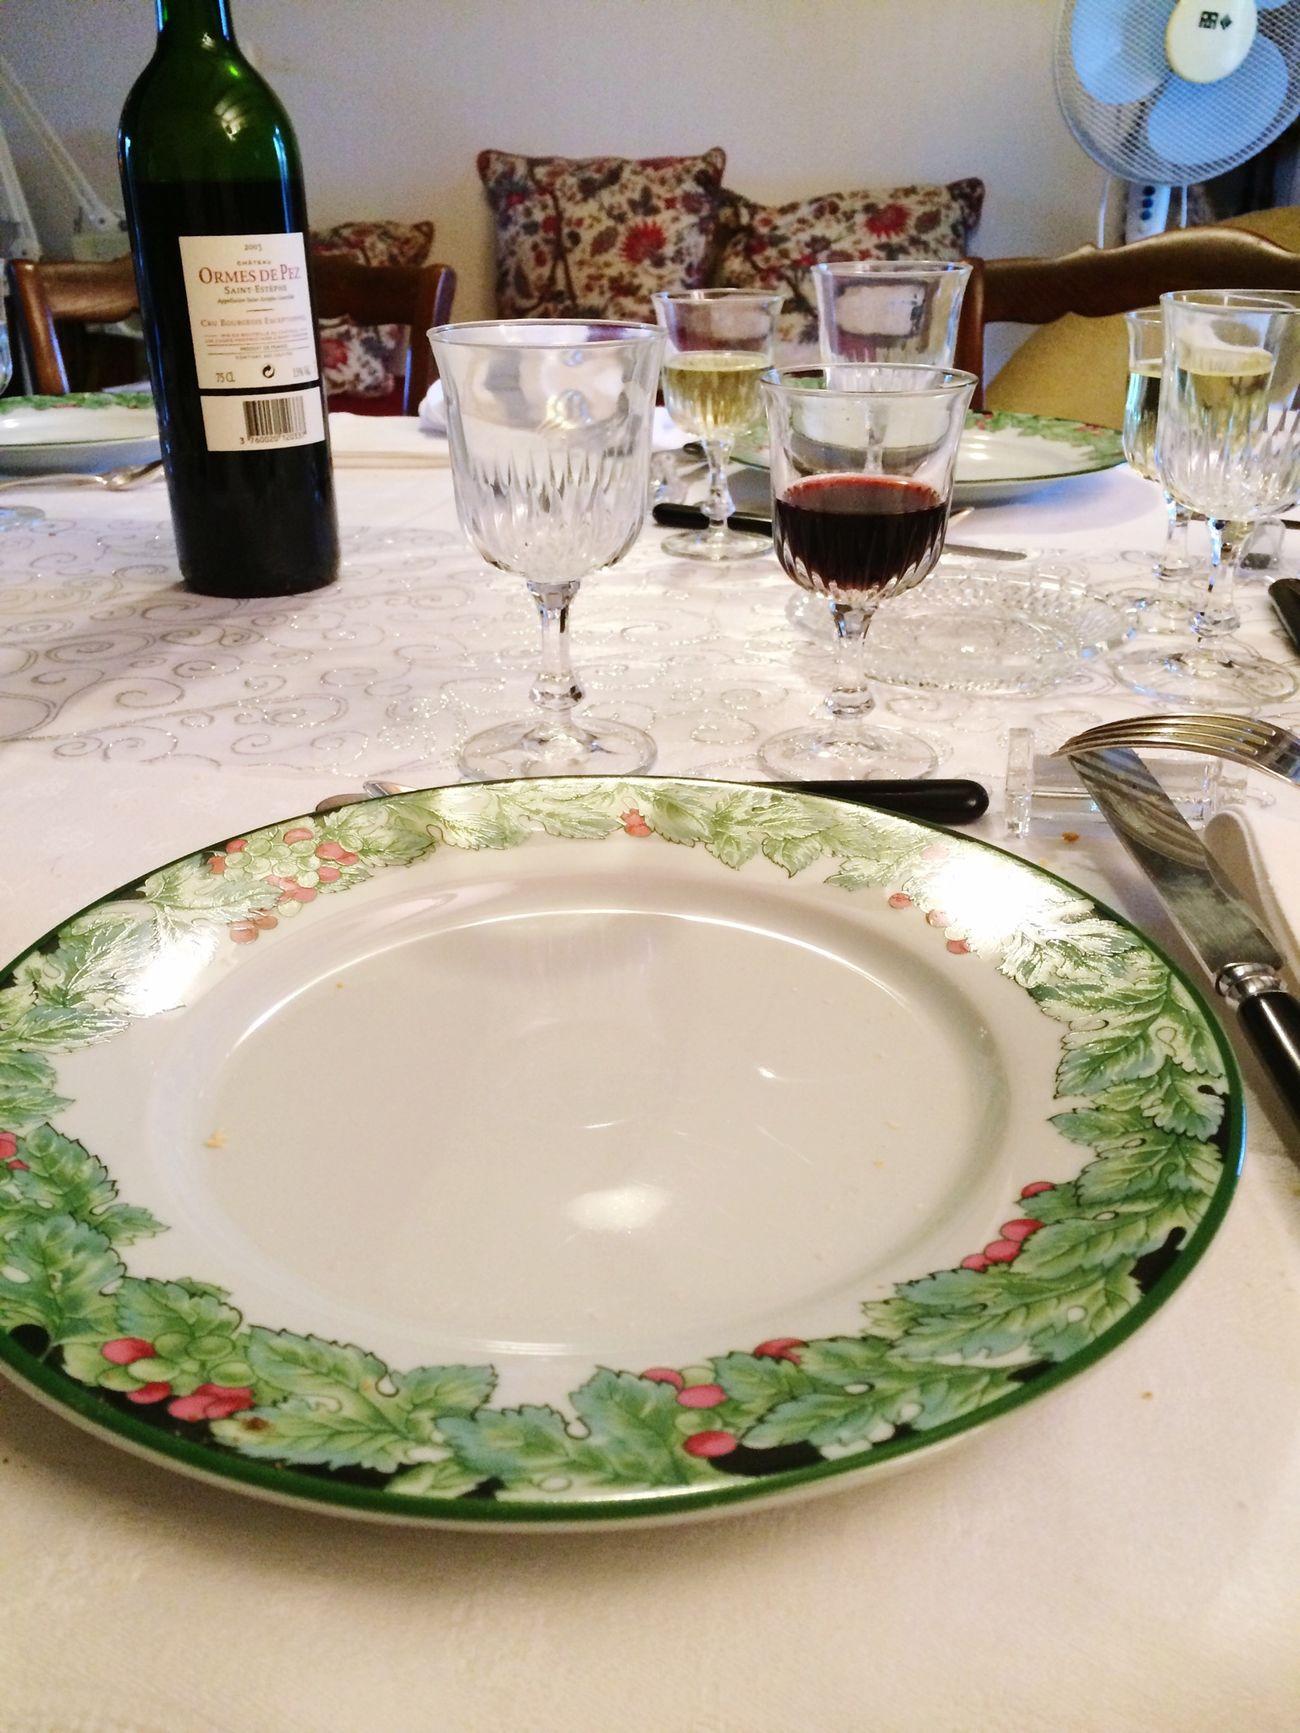 Merry Christmas! Enjoying A Meal